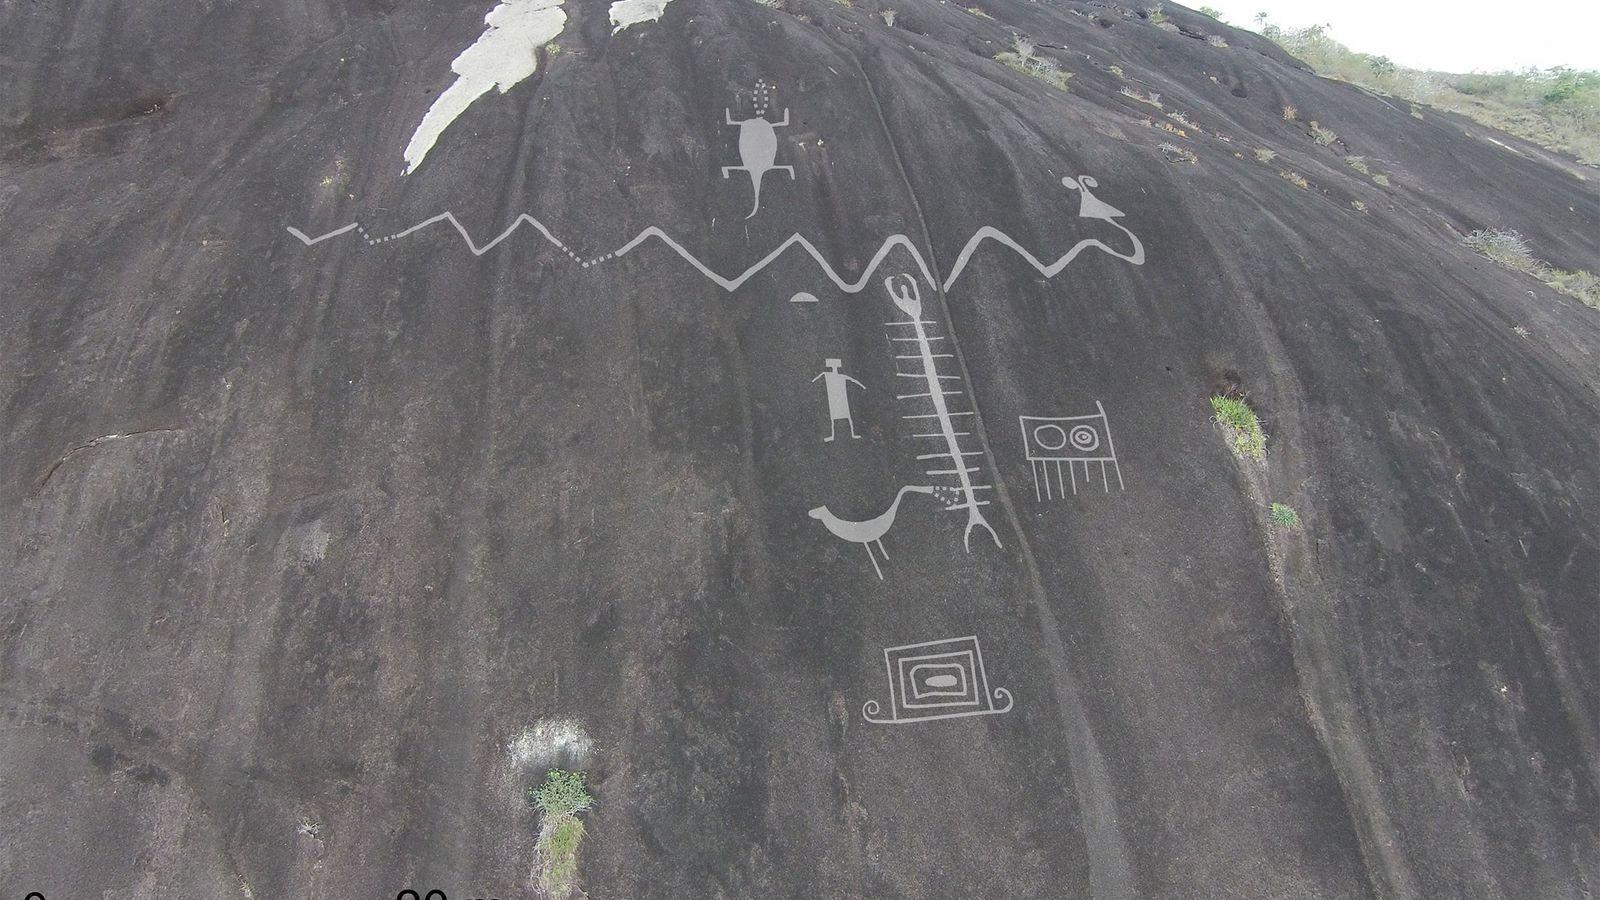 Fotografia aérea dos petróglifos gigantes